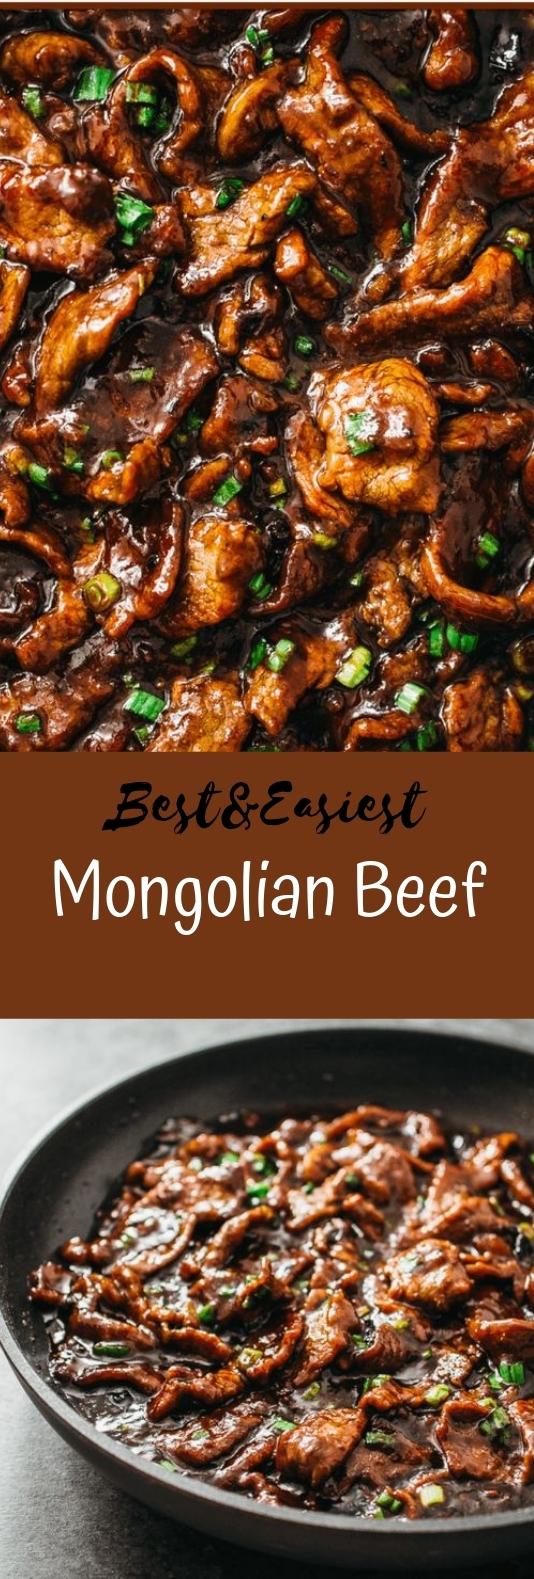 MONGOLIAN BEEF RECIPE #beef #bestrecipe